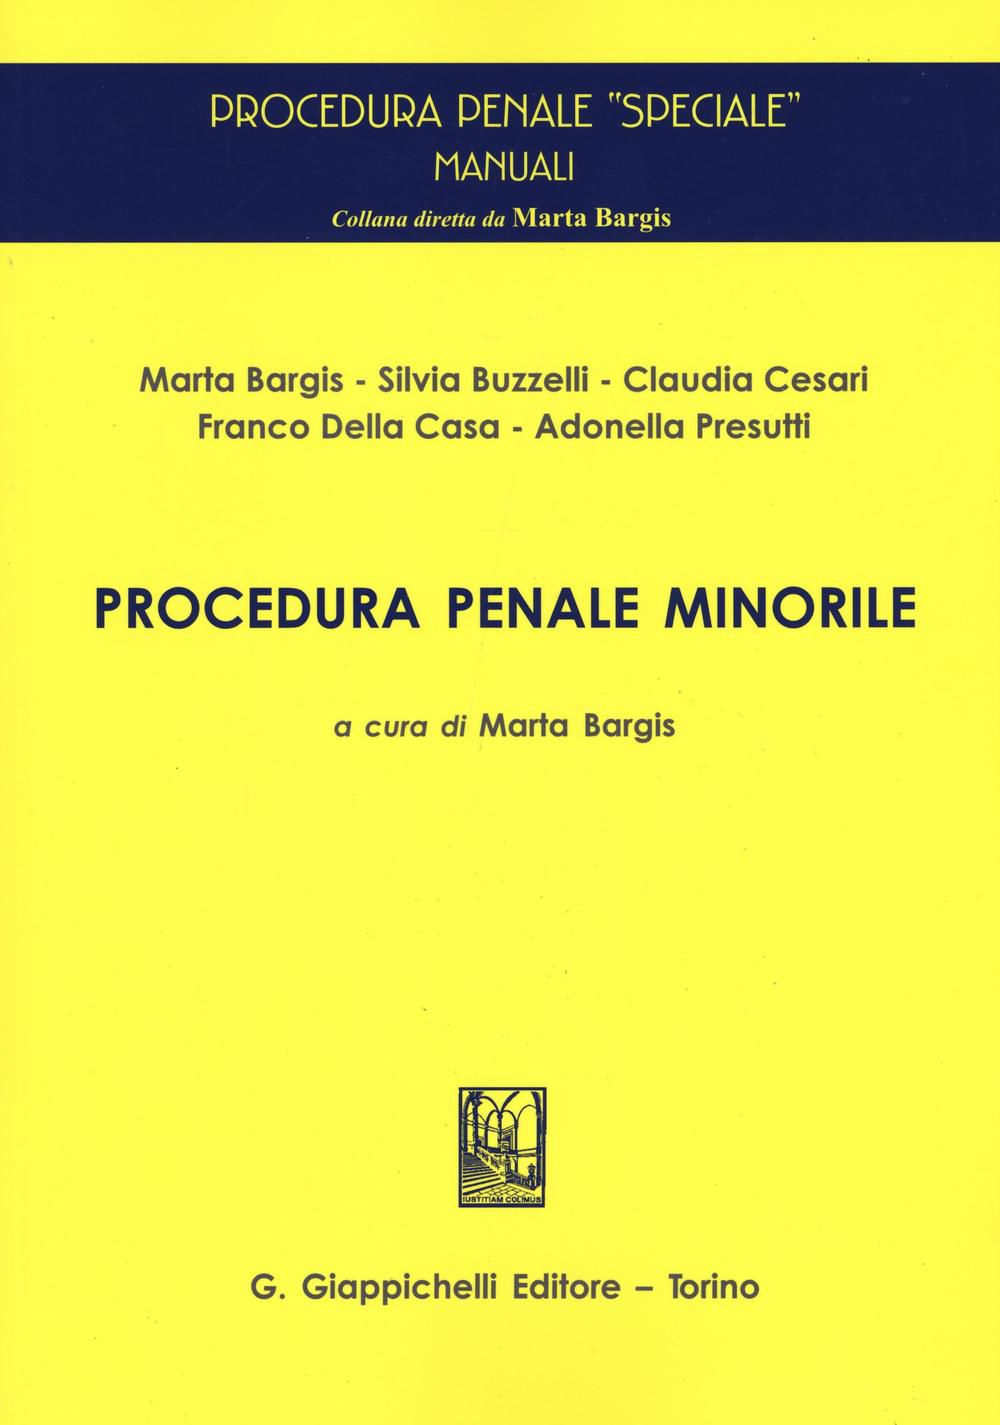 Procedura penale minorile. Marta Bargis [et al.] ; a cura di Marta Bargis